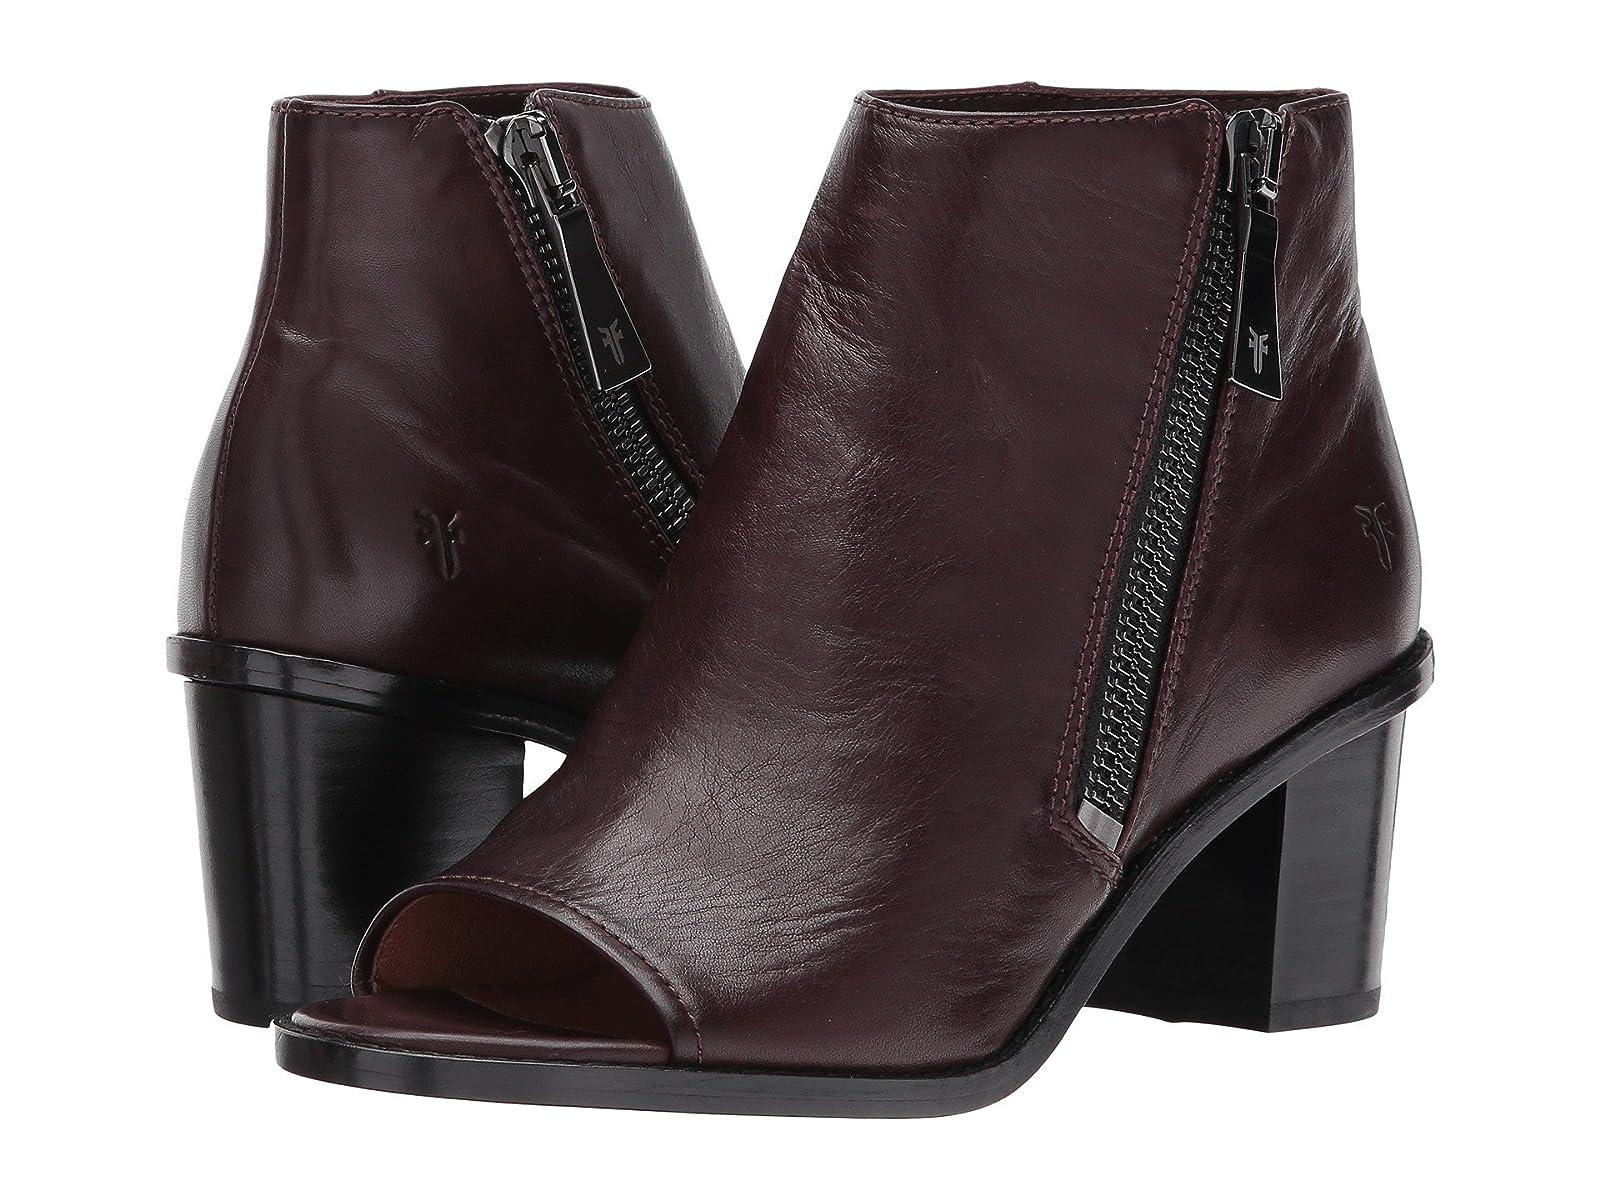 Frye Brielle Zip Peep BootieCheap and distinctive eye-catching shoes